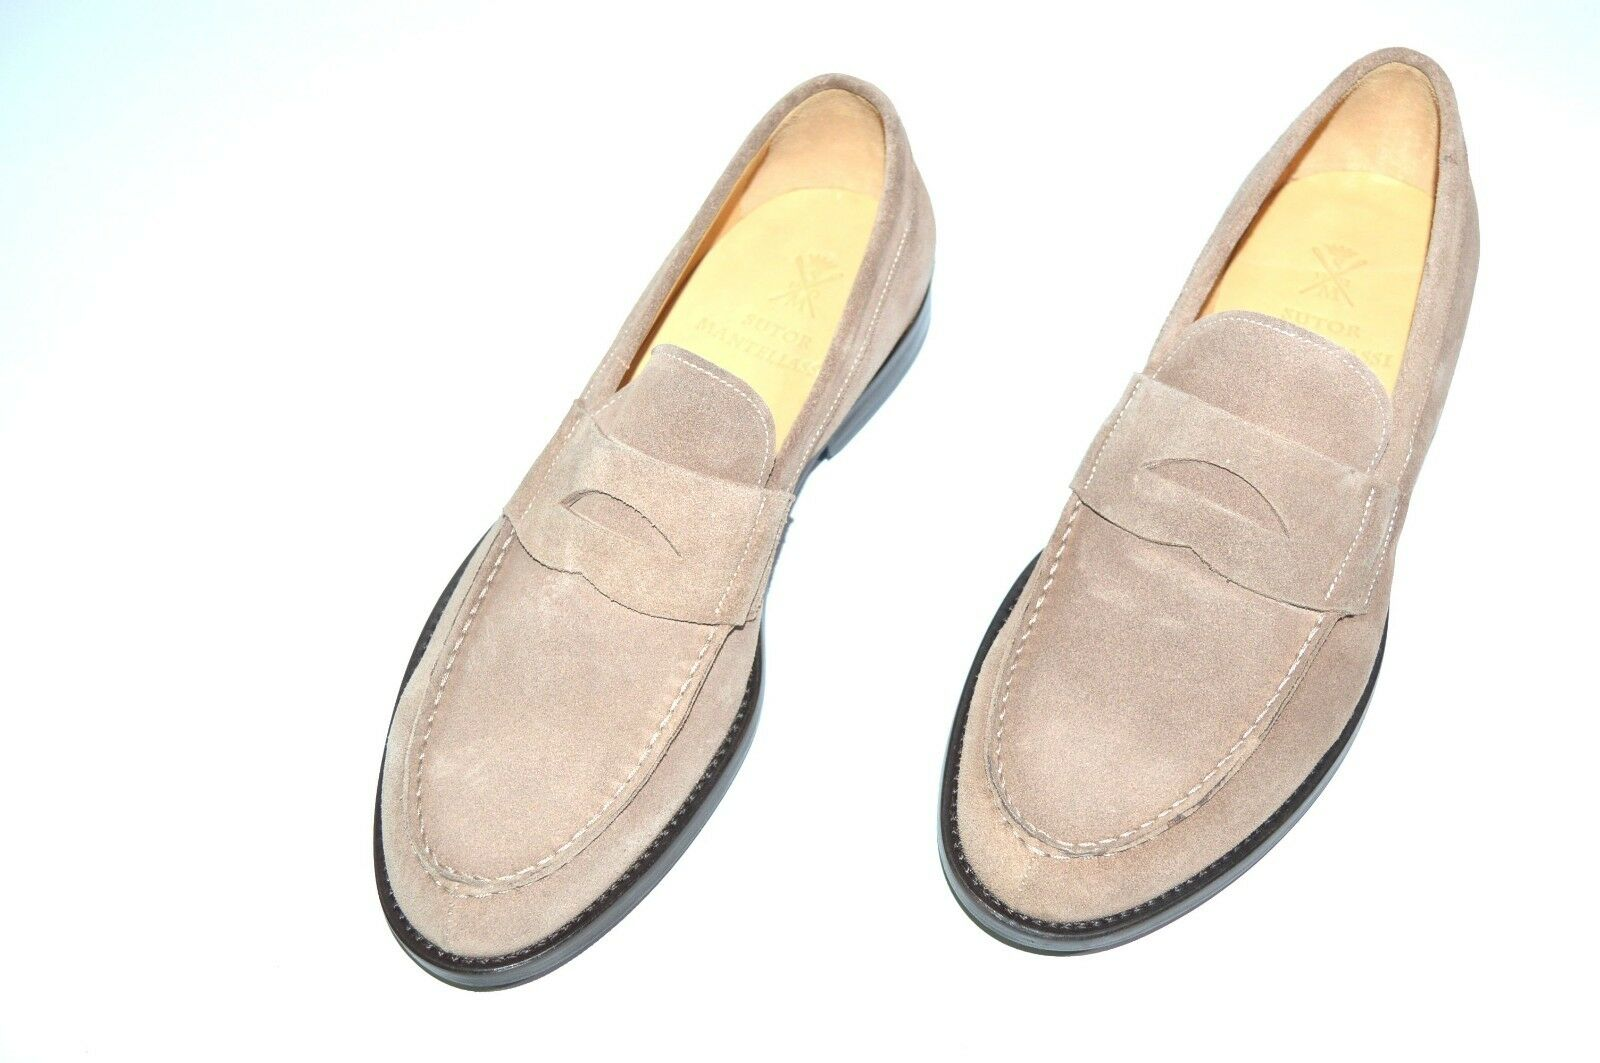 NEW 940,00 SUTOR MANTELLASSI  shoes Size Eu 40.5 Uk 6.5 Us 7.5 (Cod 161)